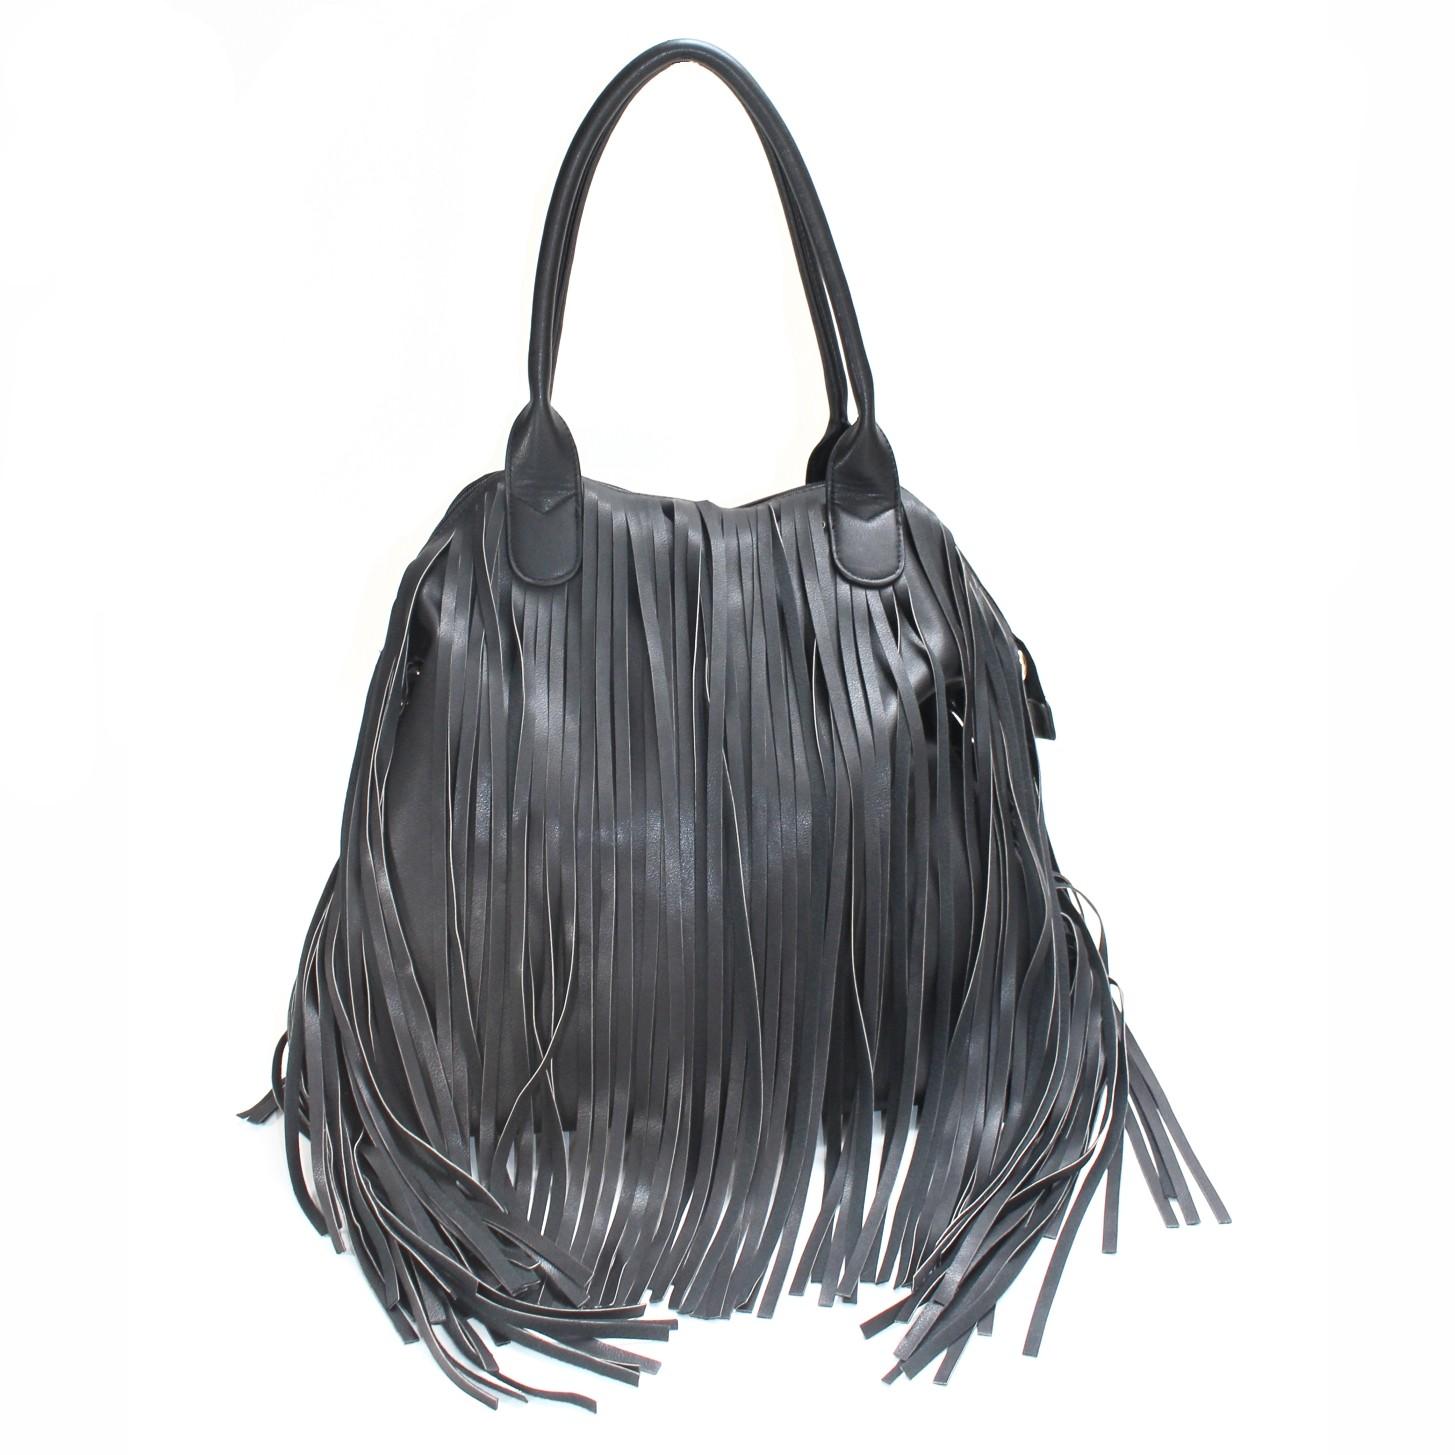 black fringe bagsLazenay Fringe Bag in Black cvTSI9Ha